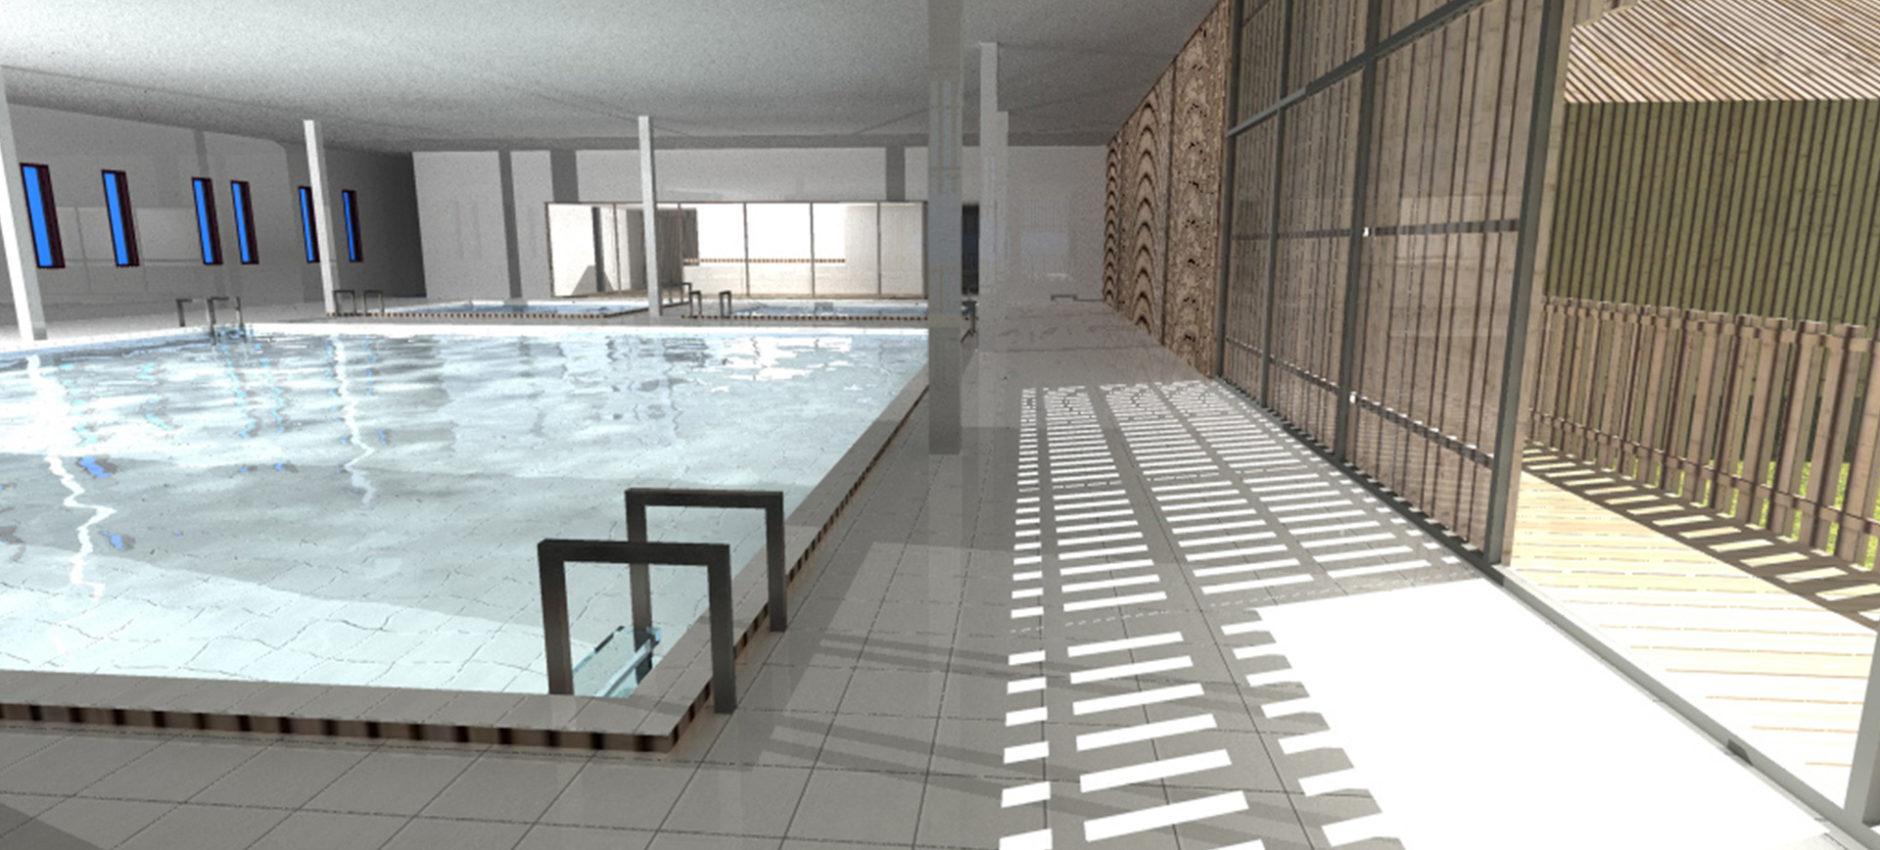 boca_architecture_projet_centre_thalasso_lanton_05.jpg